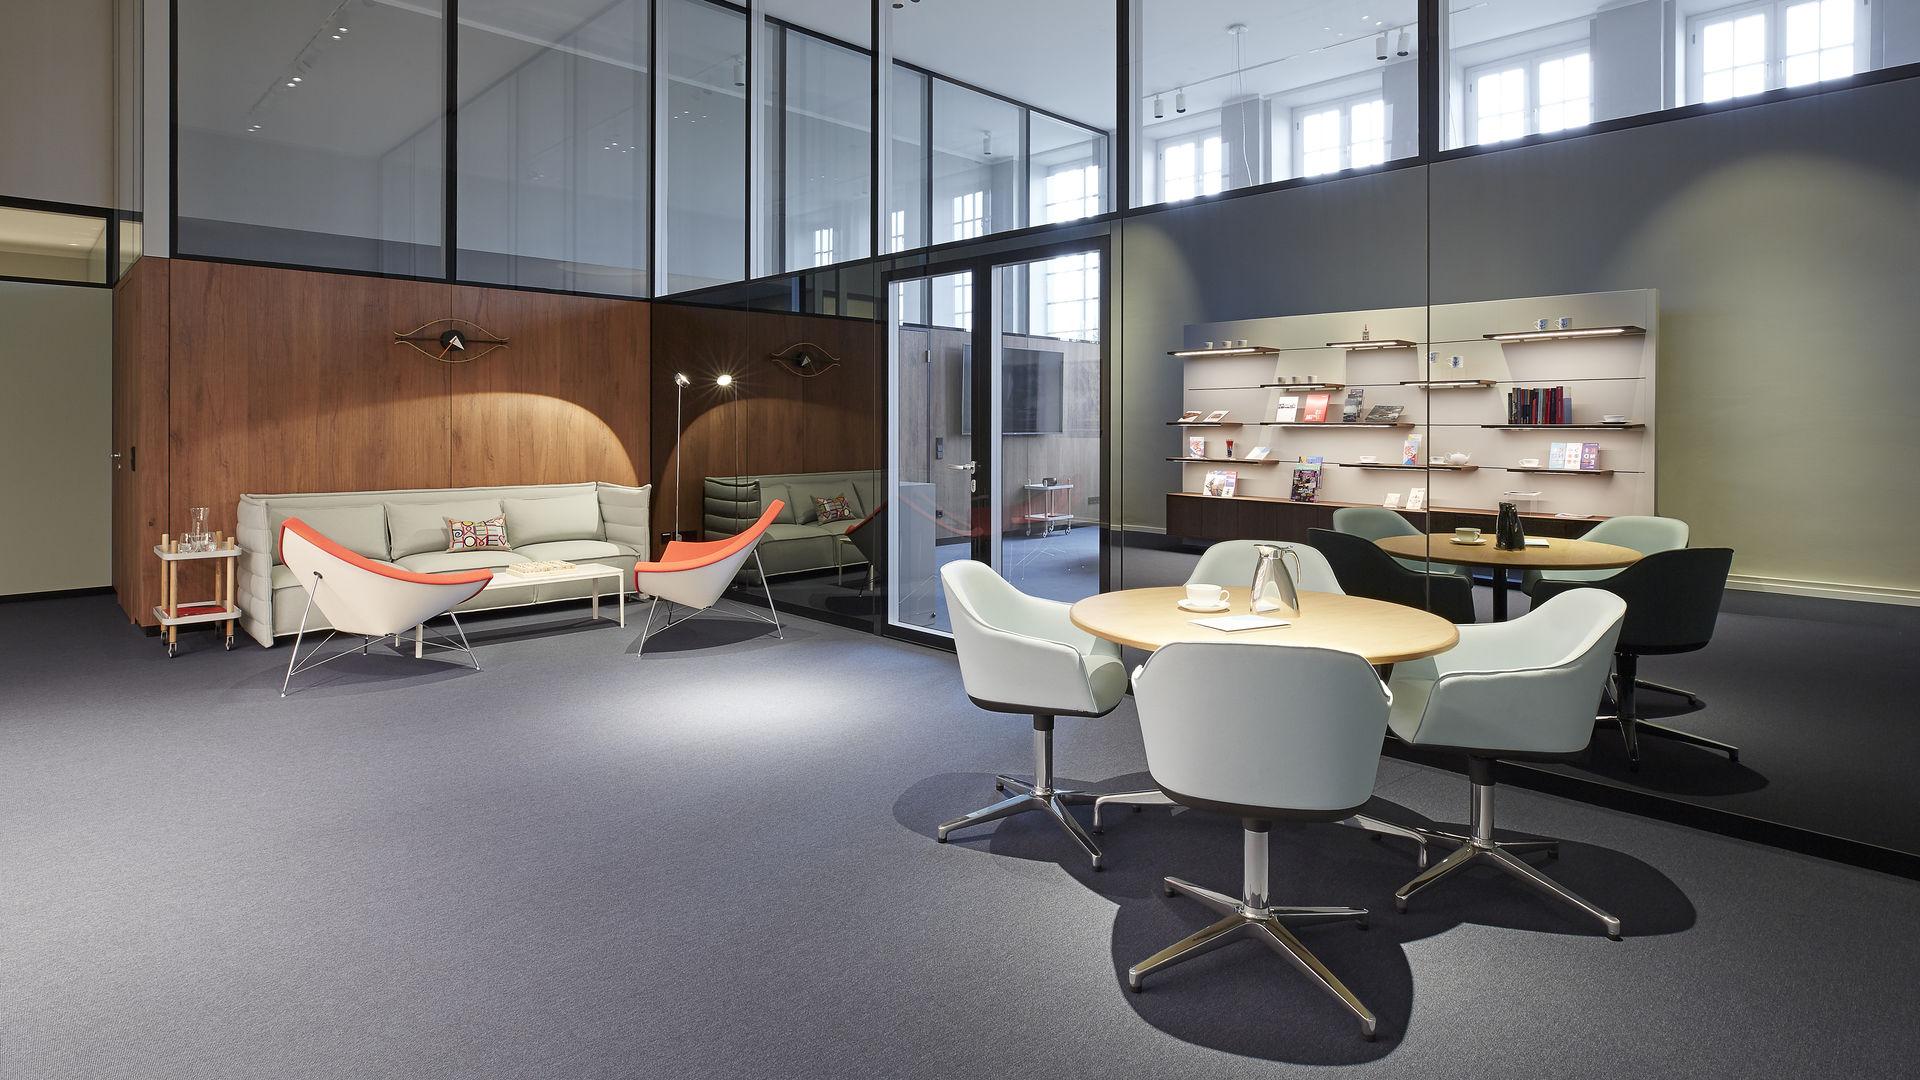 Stiftung Historischer Museen_web_16-9